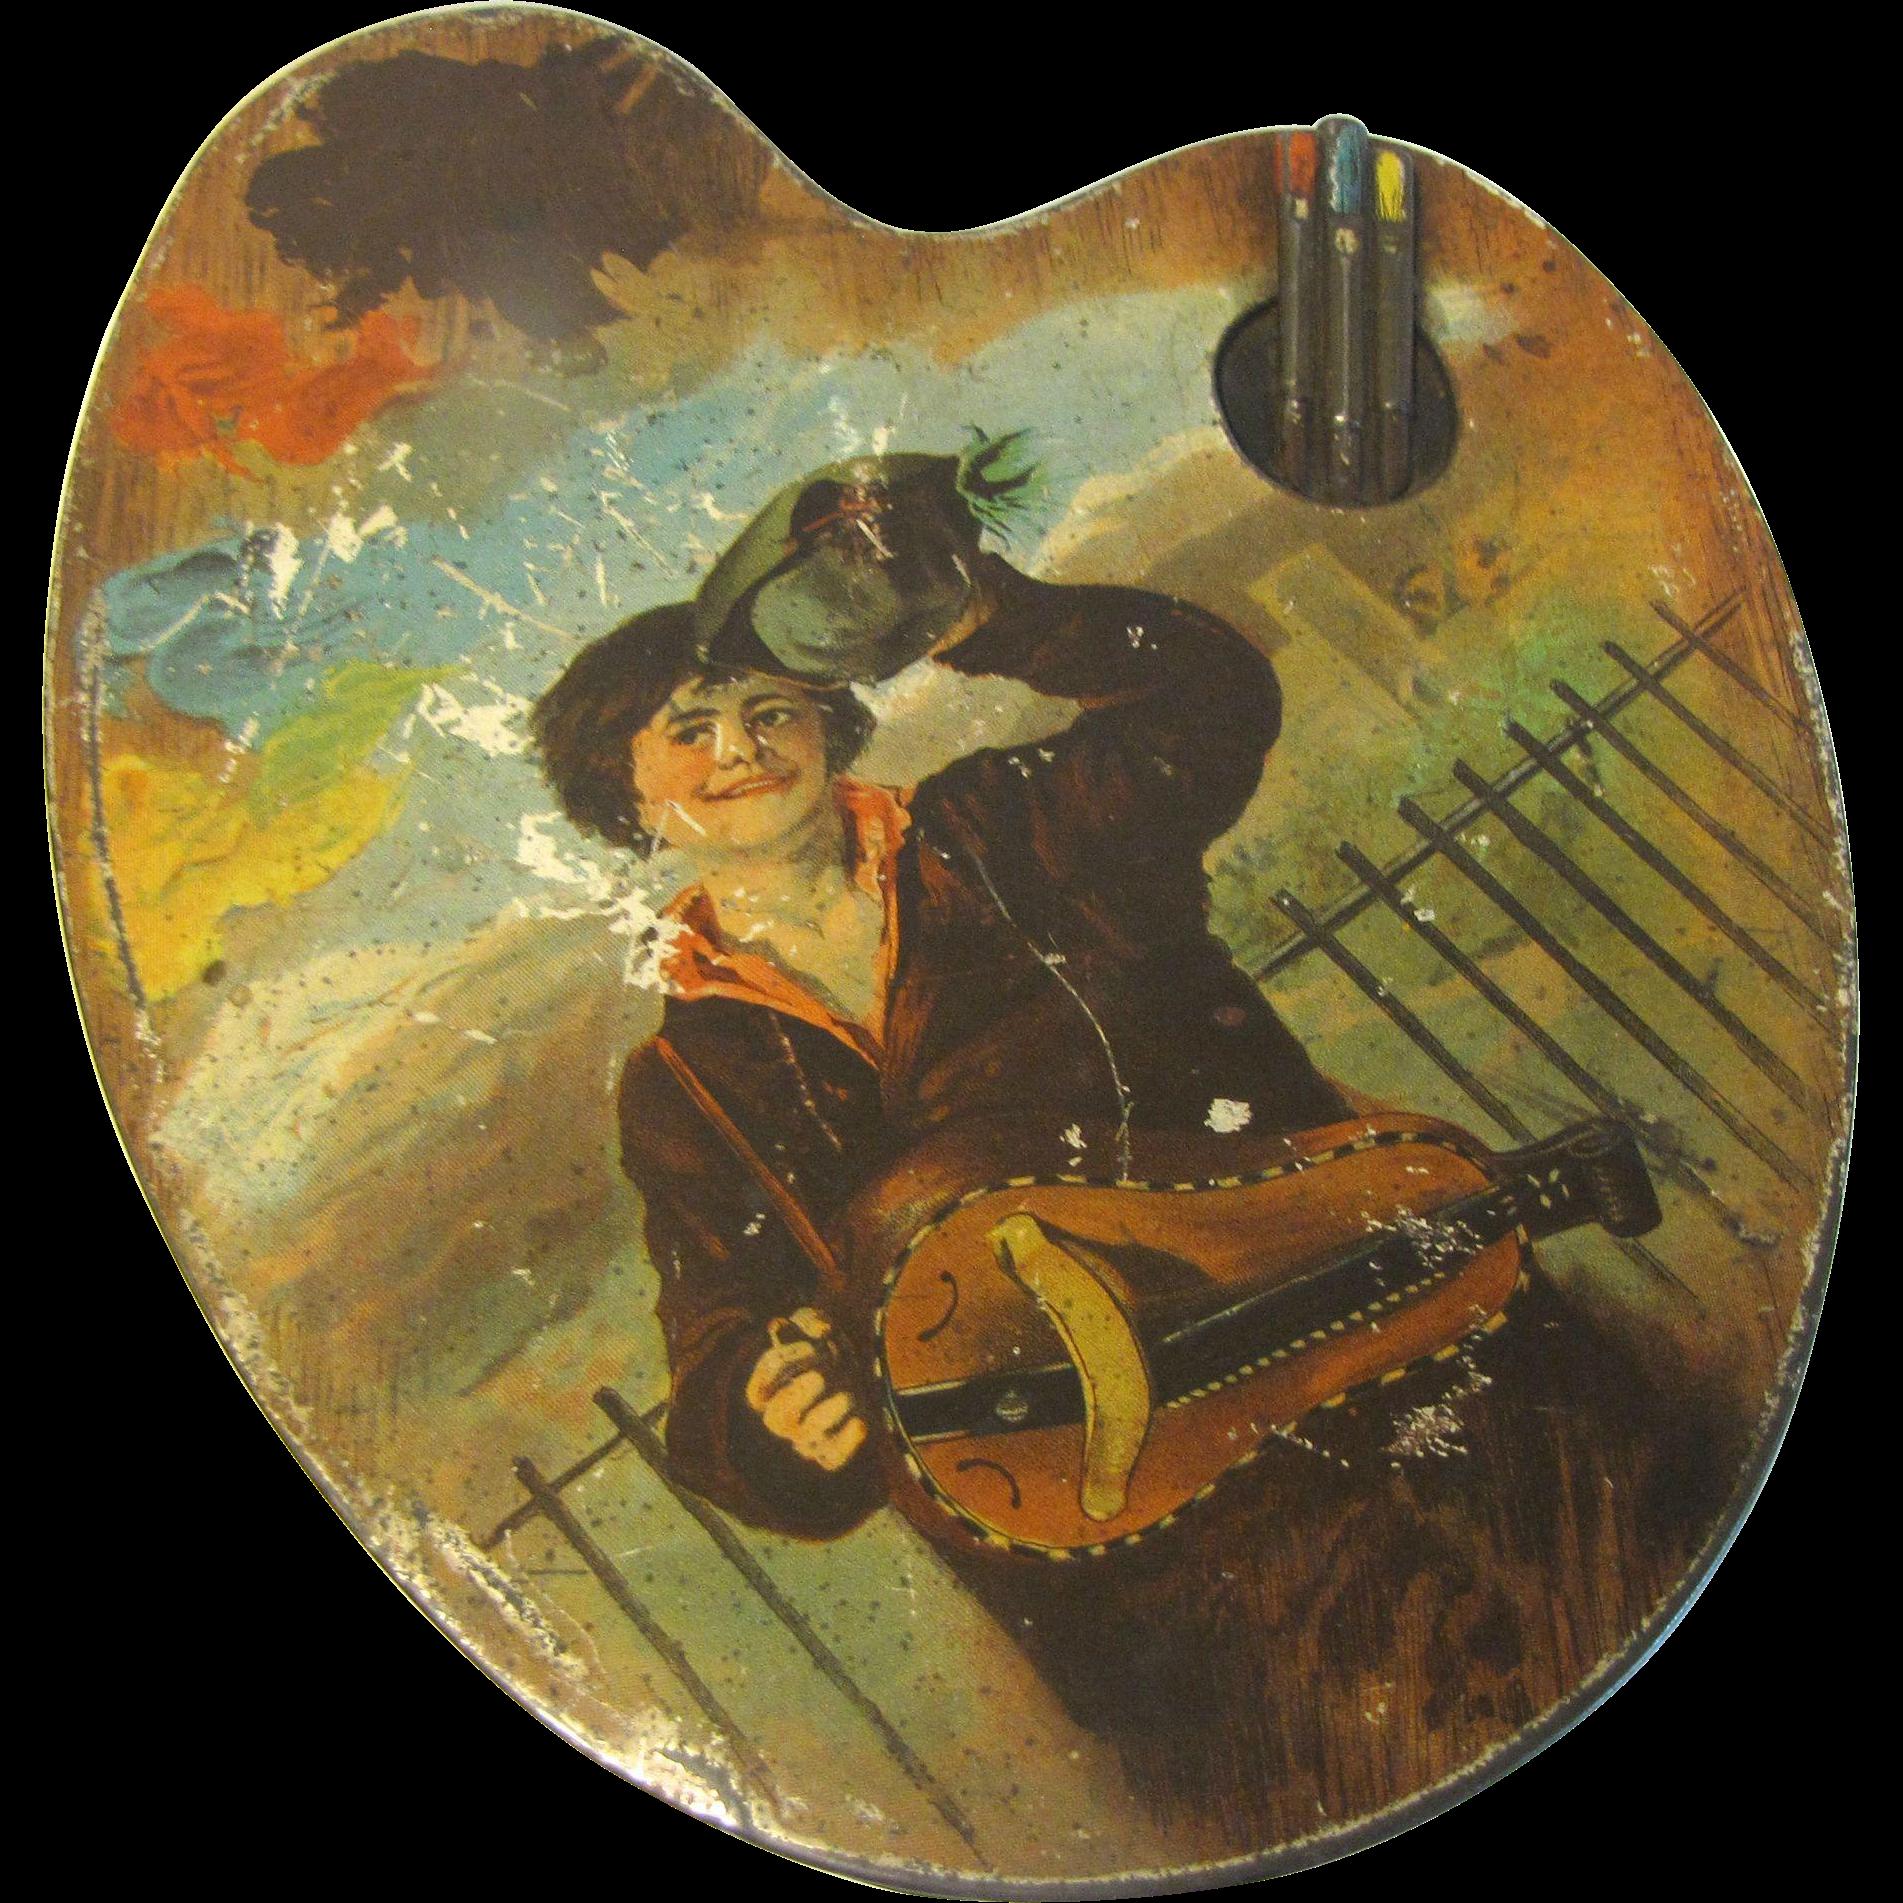 Huntley & Palmers Antique Biscuit Tin ARTIST PALETTE